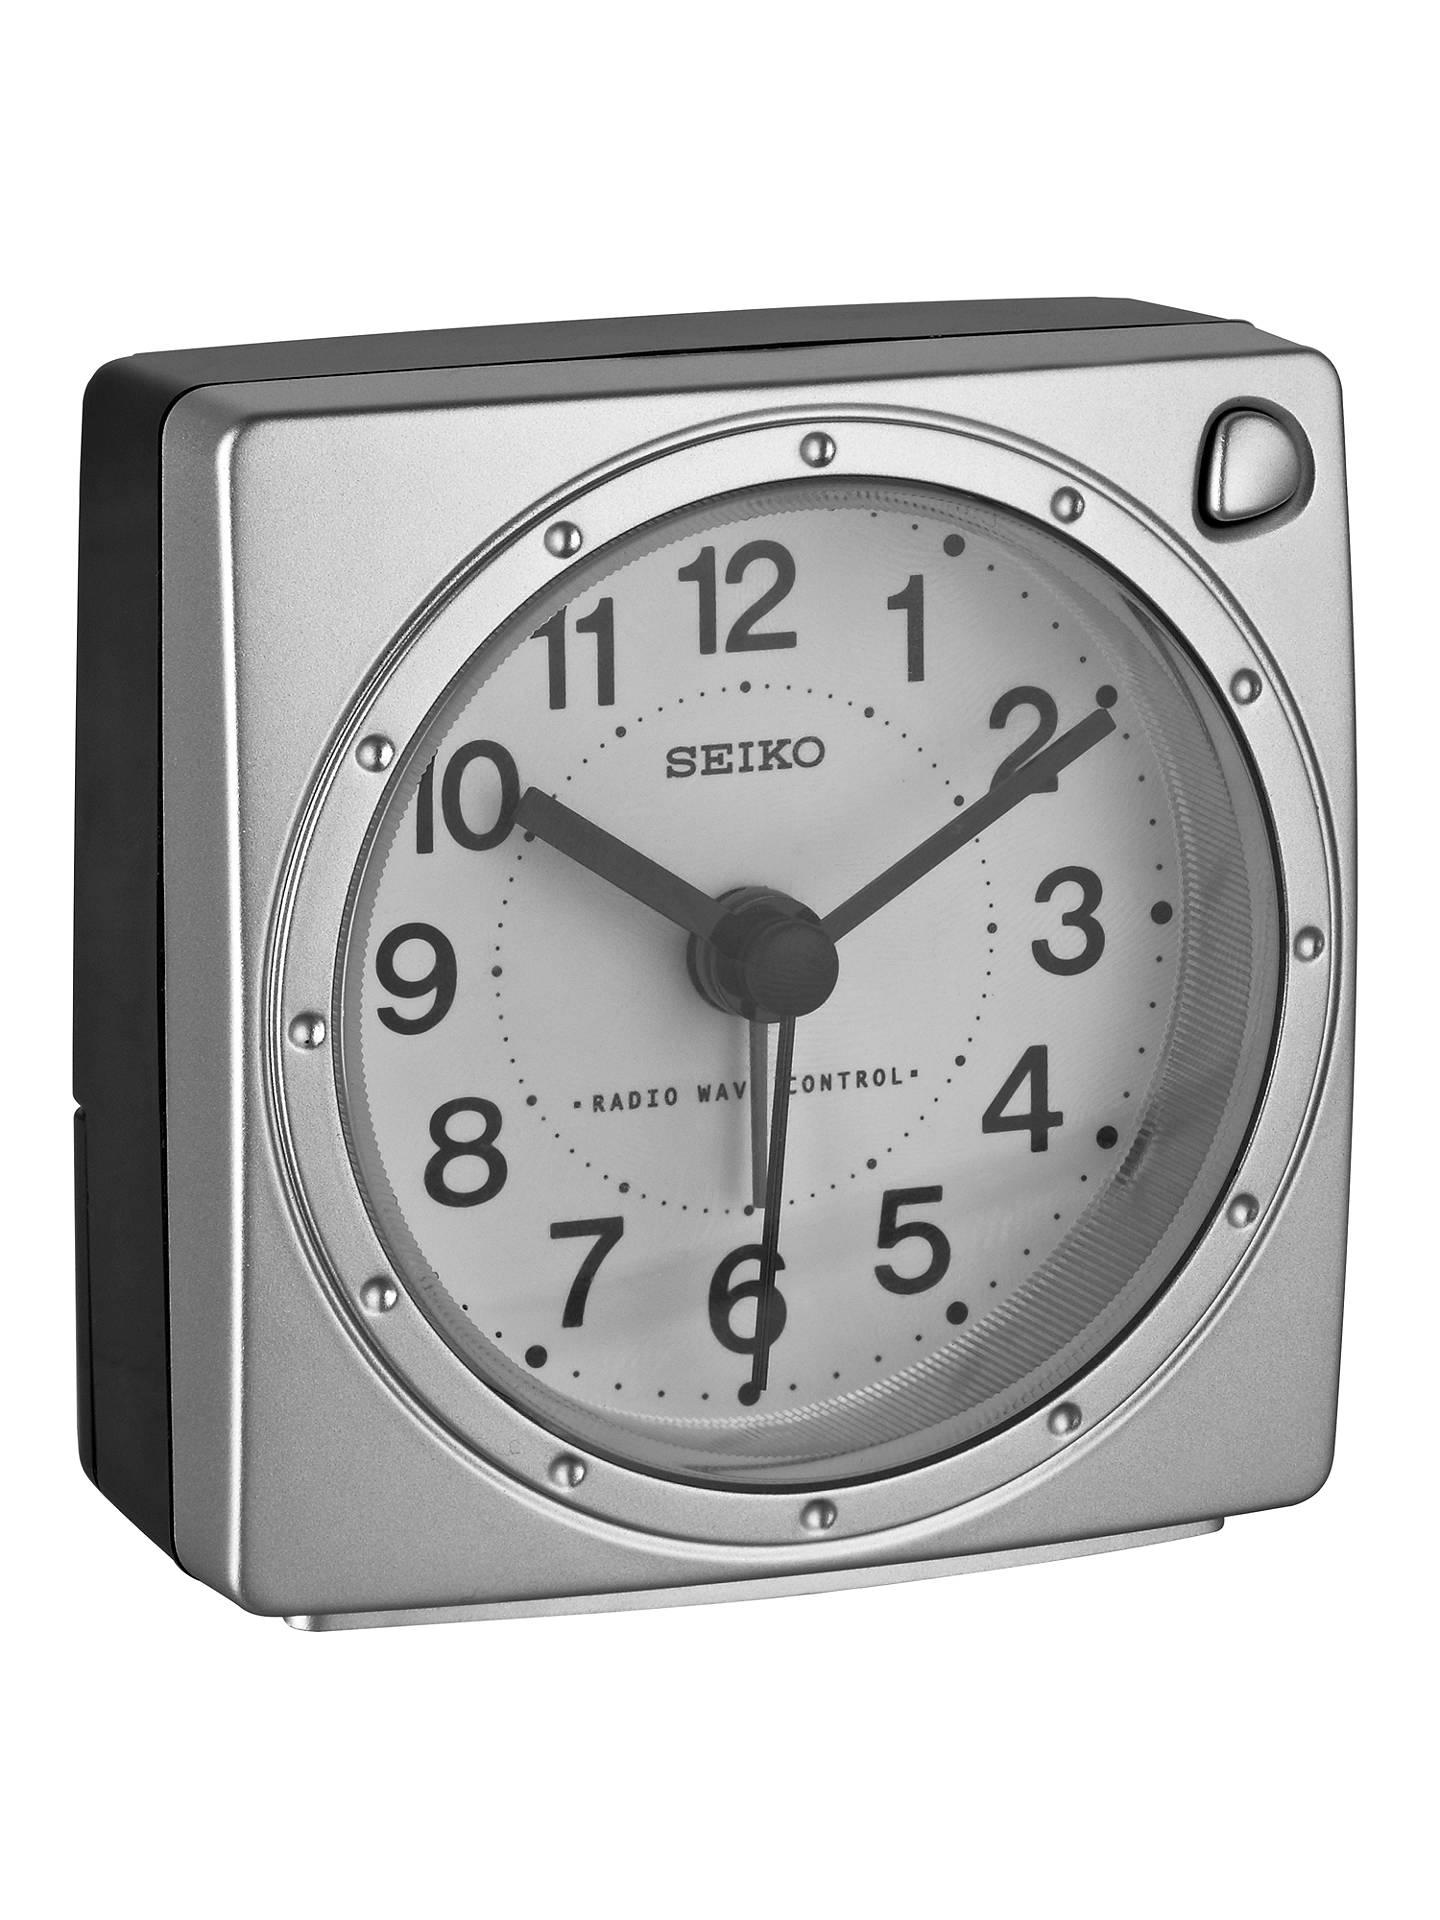 Seiko Radio Controlled Alarm Clock at John Lewis & Partners